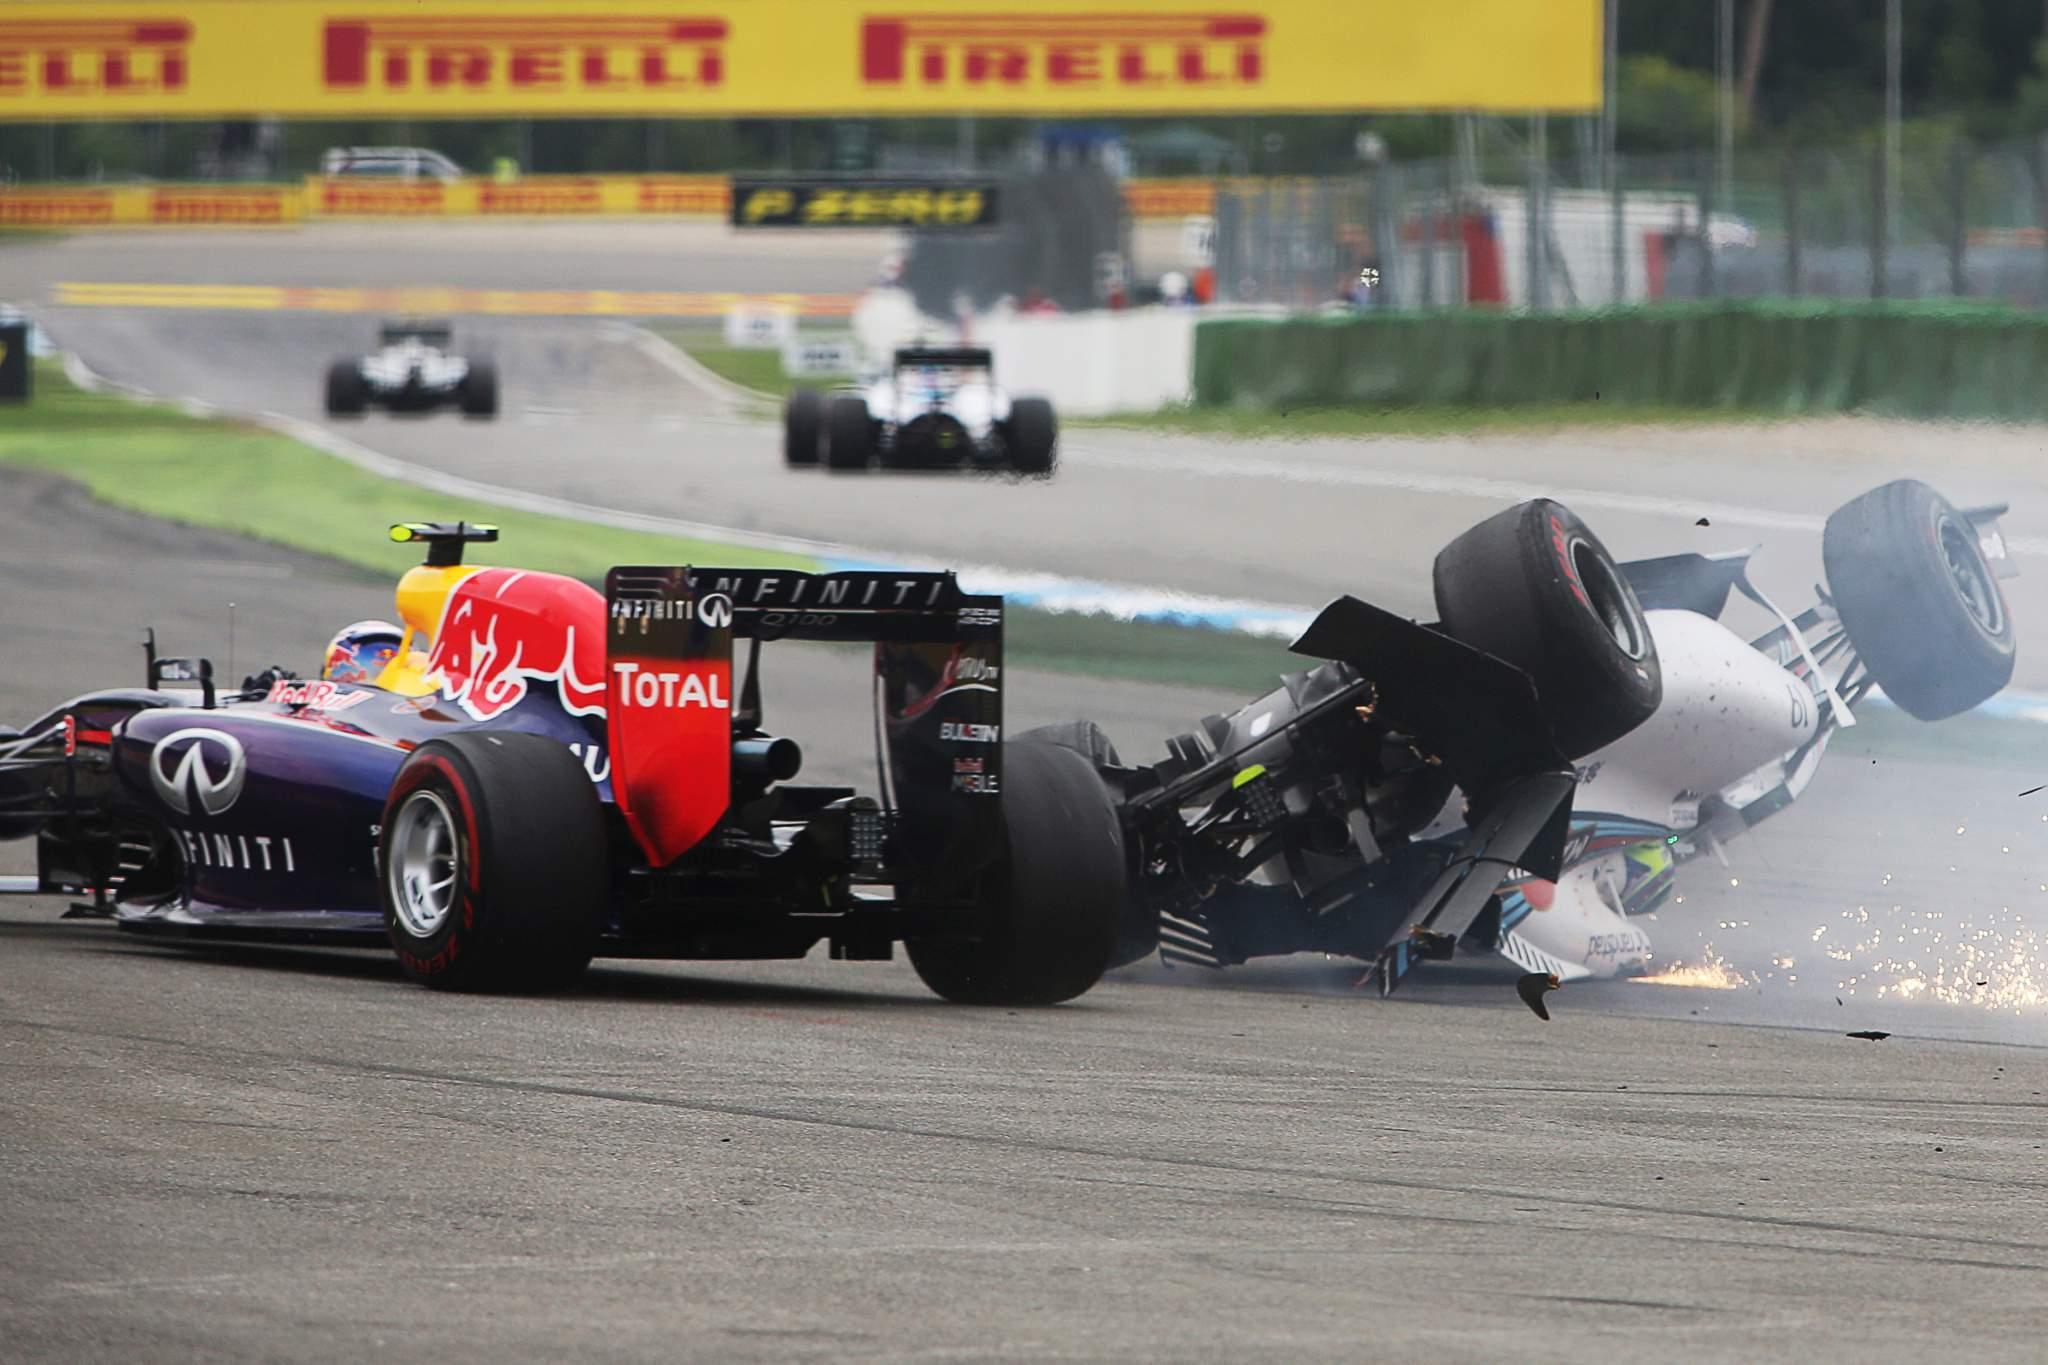 Daniel Ricciardo Red Bull Felipe Massa Williams upside down crash German Grand Prix 2014 Hockenheim